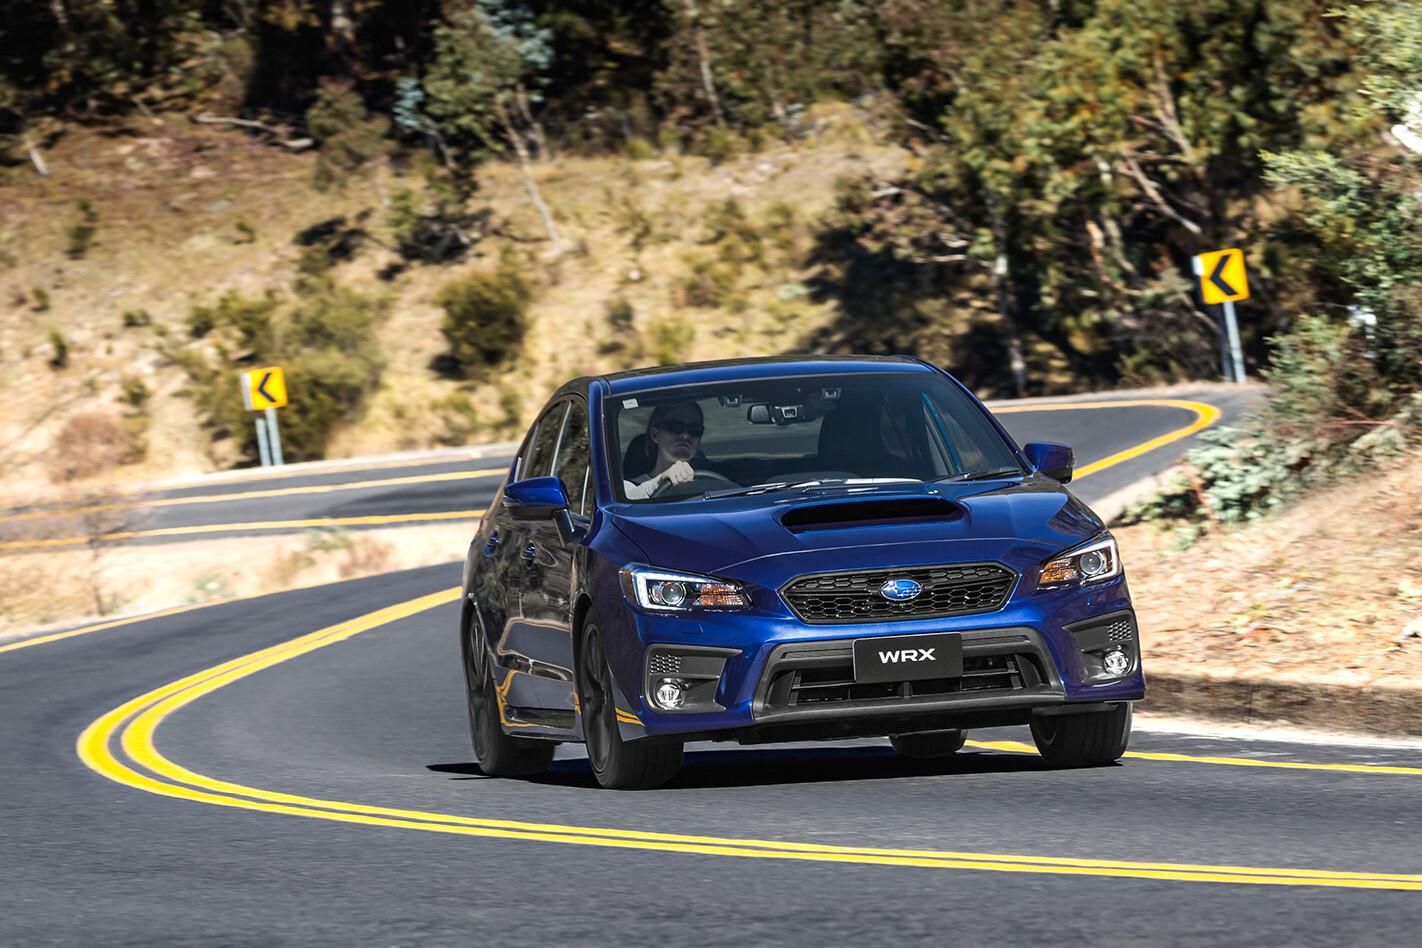 Subaru Wrx Front Quarter Action Jpg